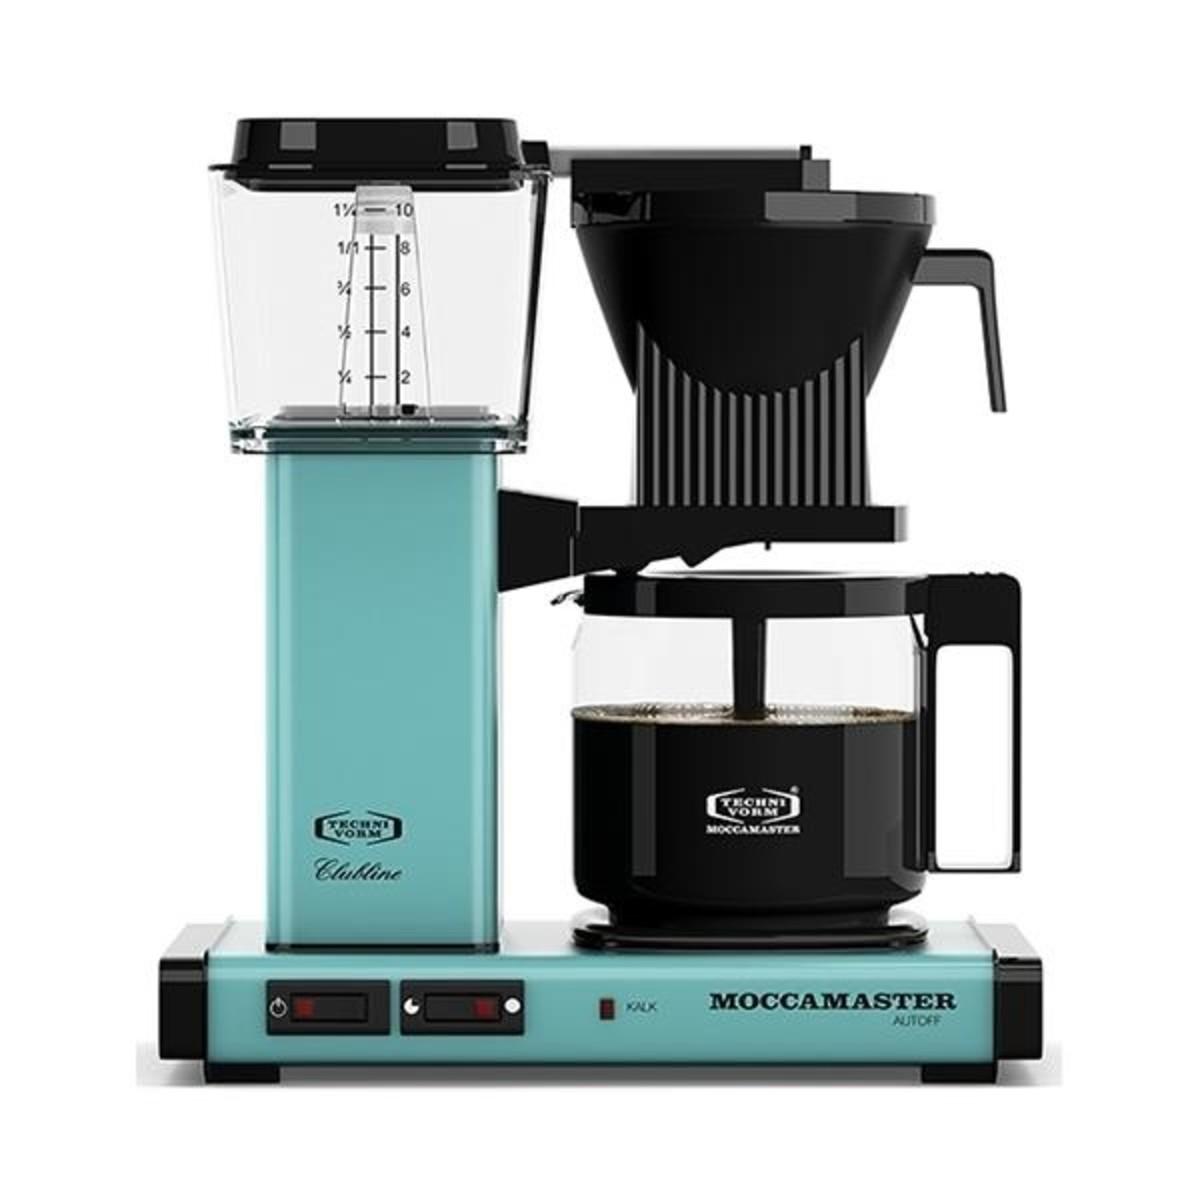 MOCCAMASTER KBGC982AO COFFEE MACHINE, TURQUOISE | Ecosto